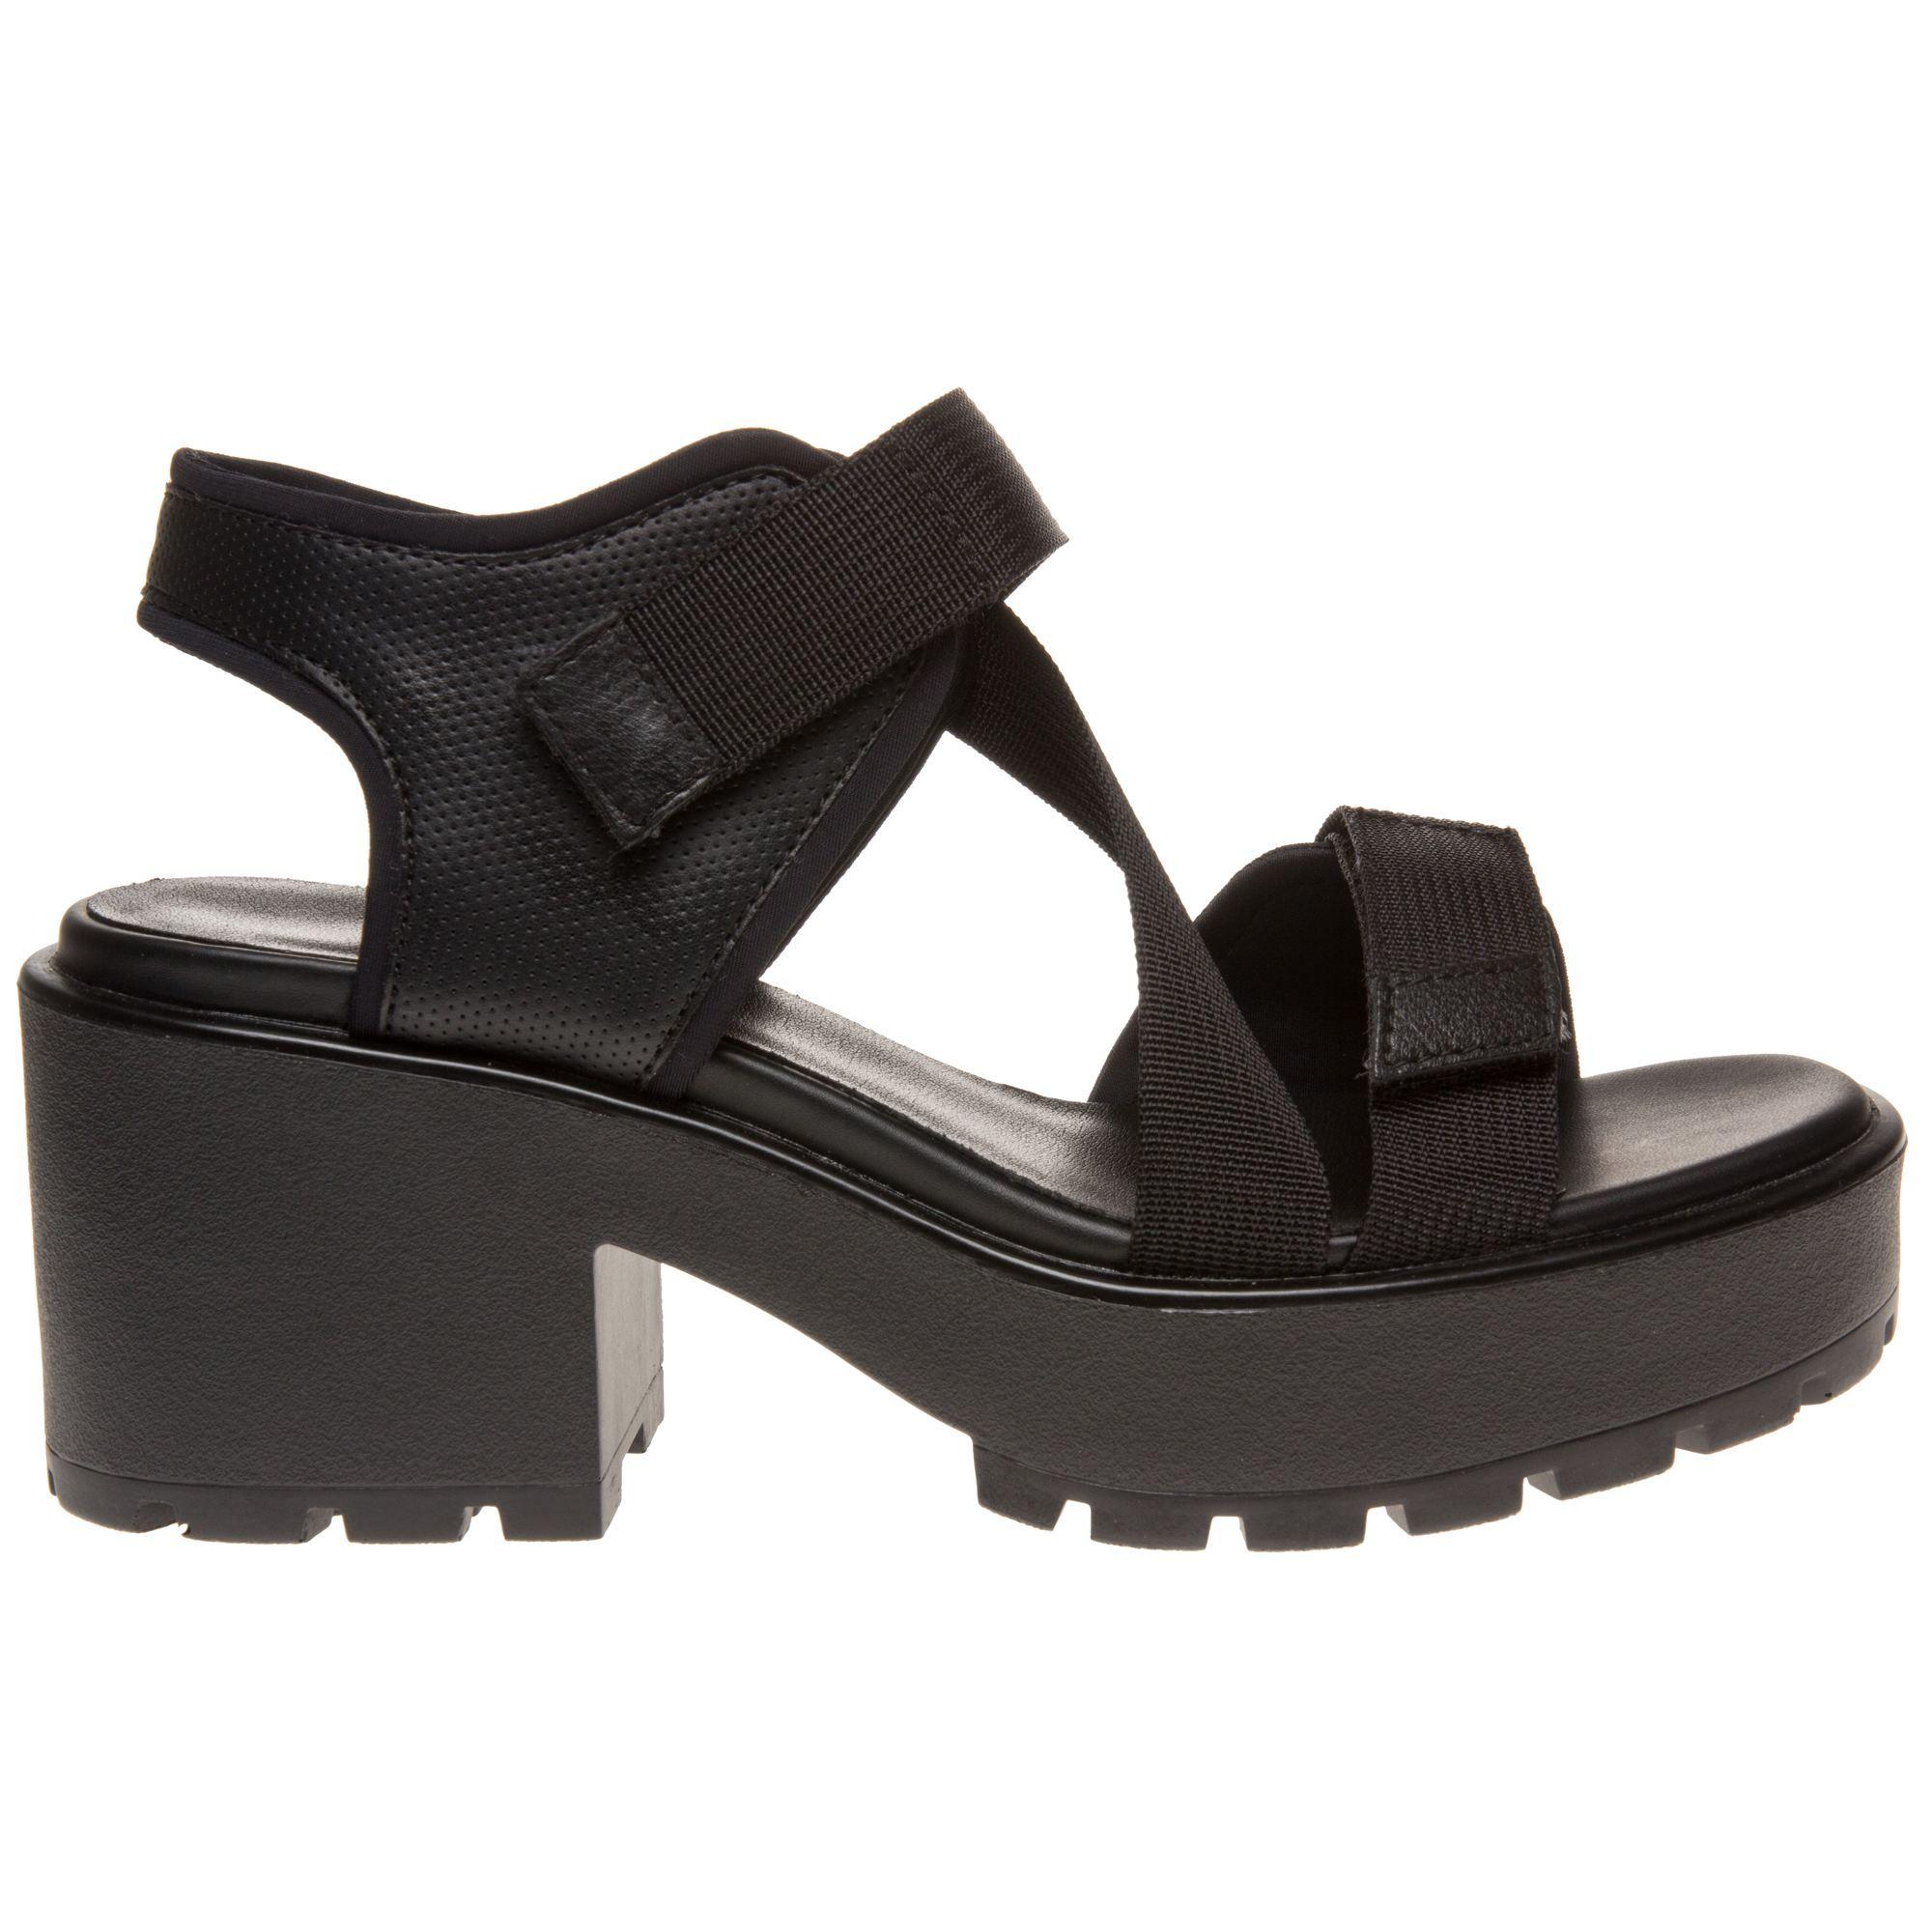 Vagabond Dioon Shoes Style 3747-569 Sandals - Women - SOLETRADER